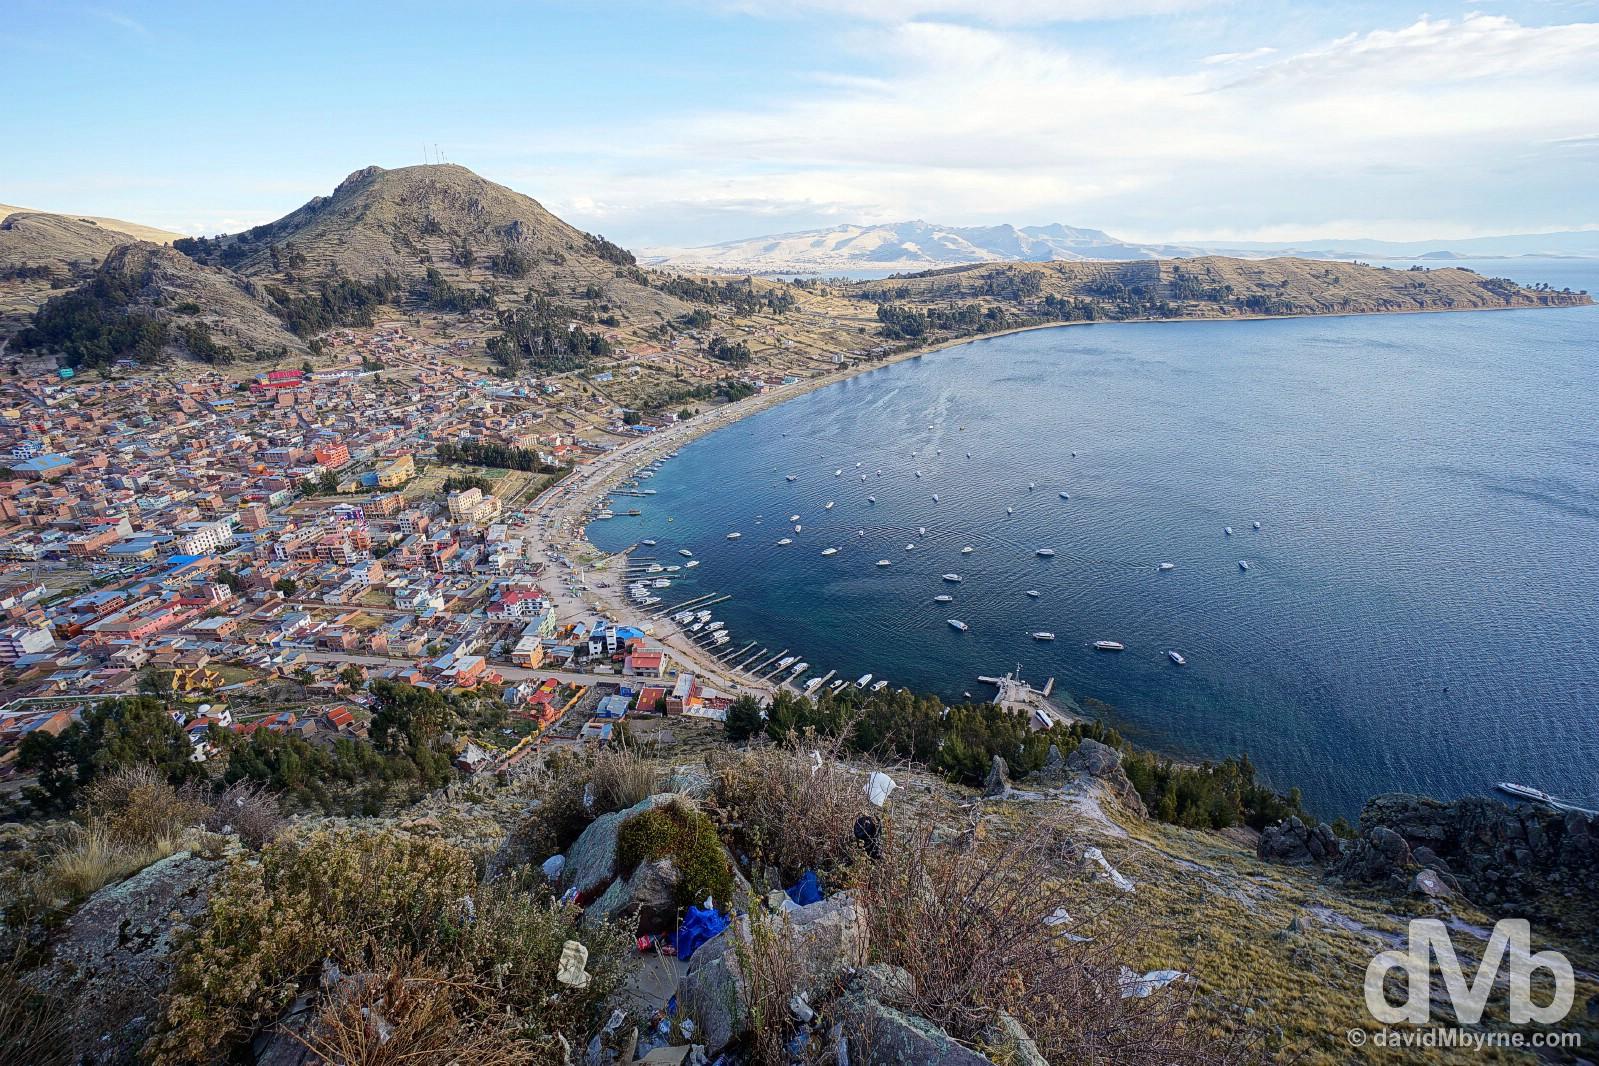 The town of Copacabana on the shores of Lake Titicaca as seen from the pilgrimage mountain Cerro Calvario. Copacabana, Bolivia. August 23, 2015.